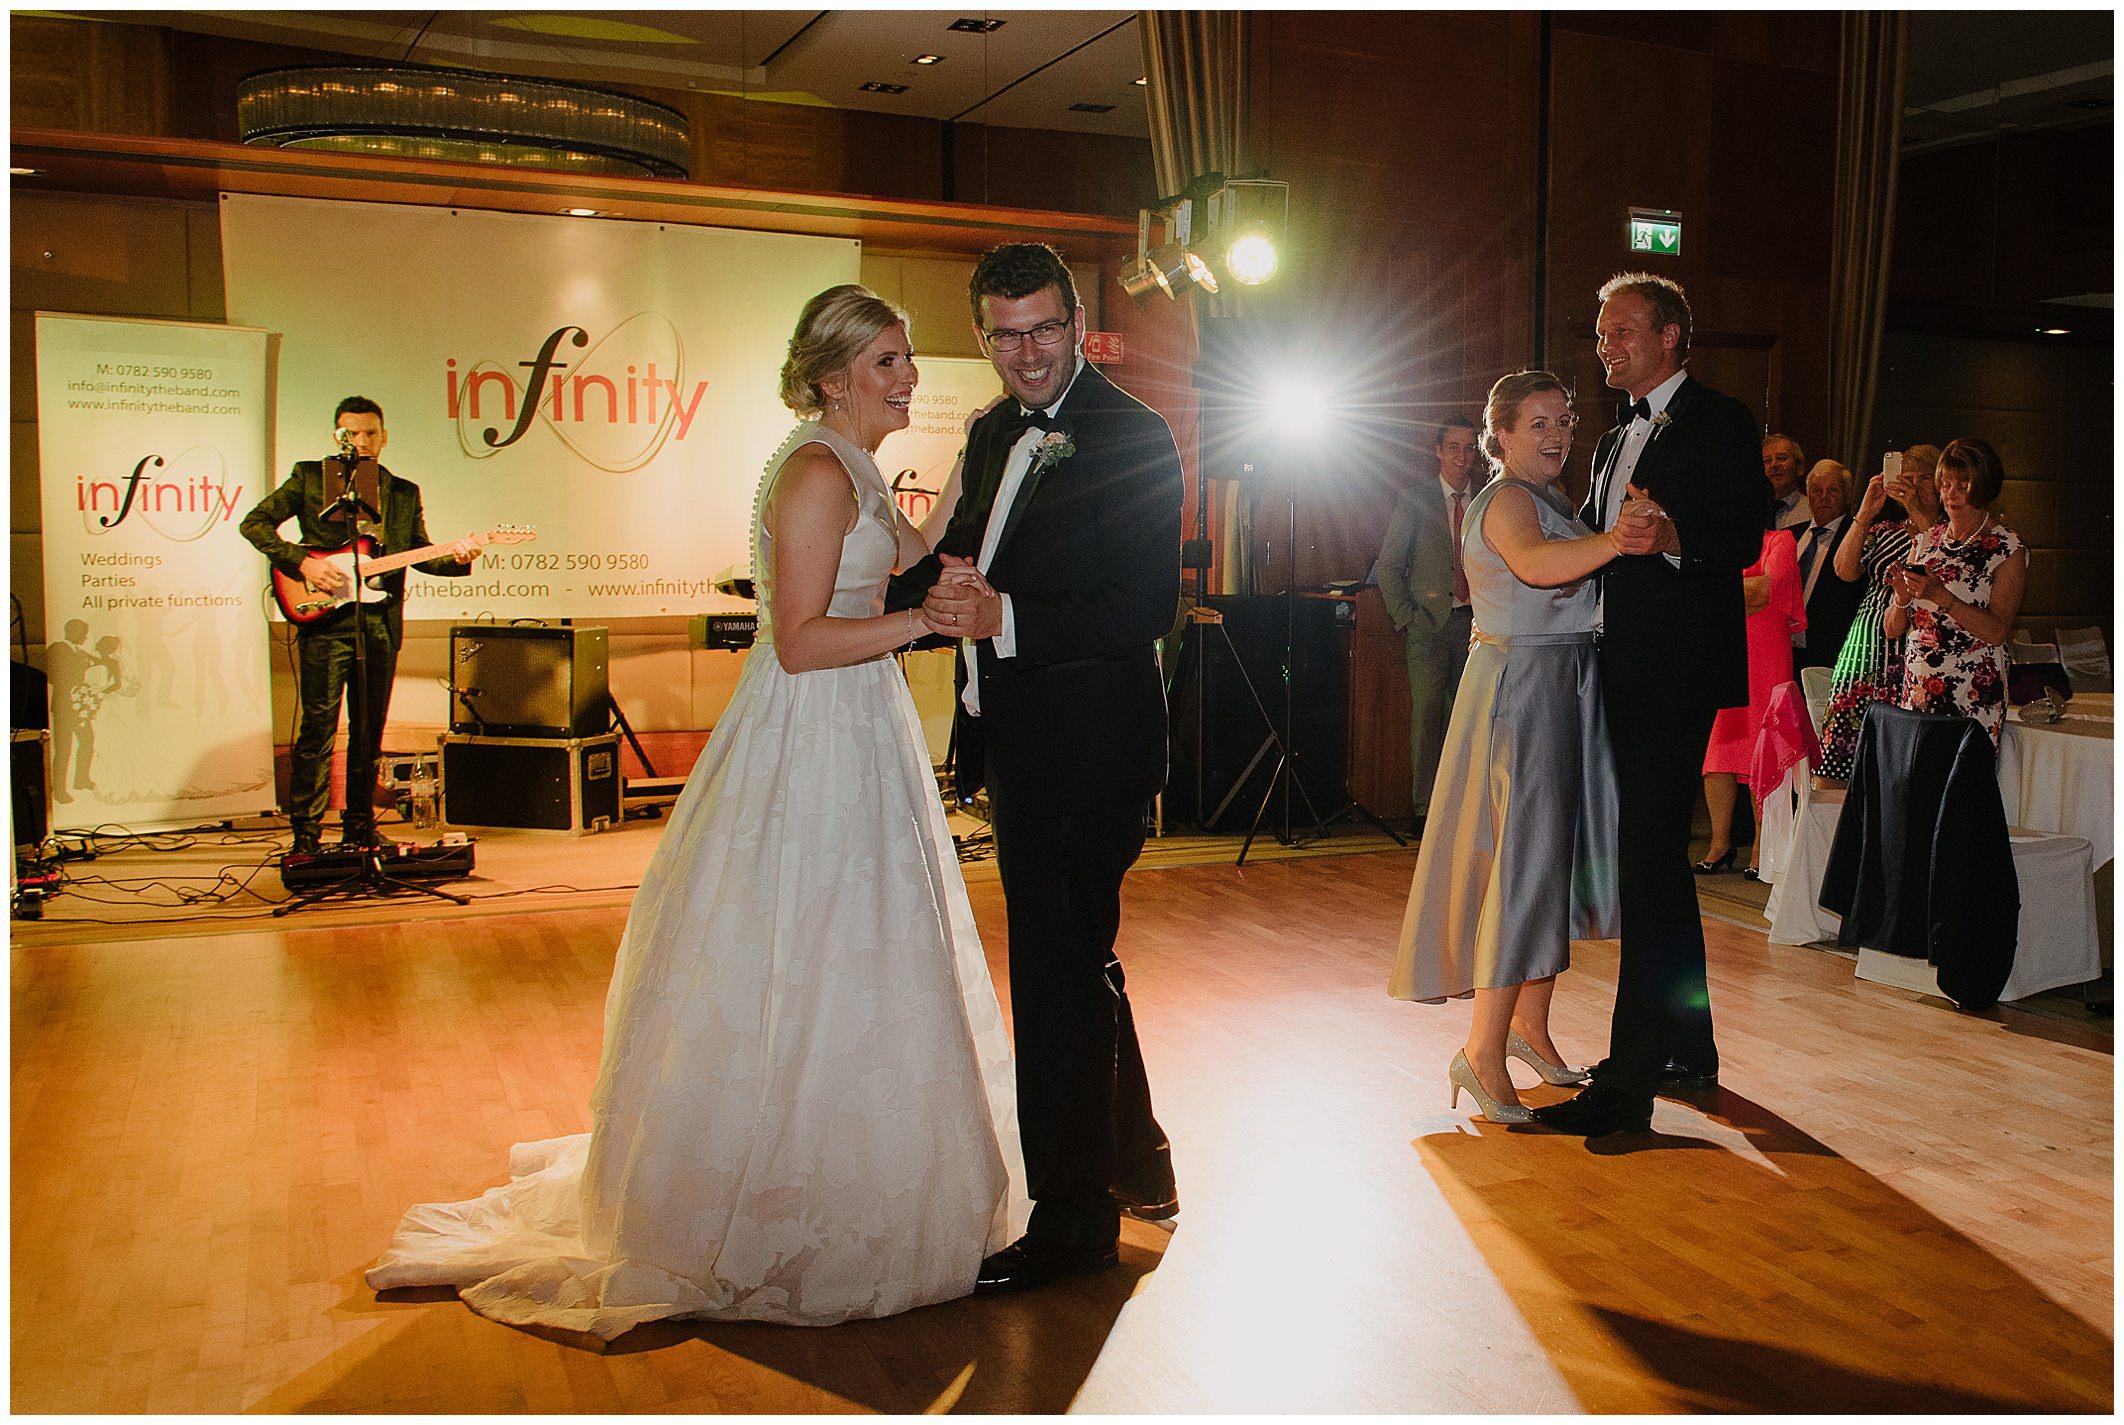 farnham-estate-wedding-jude-browne-photography_0218.jpg